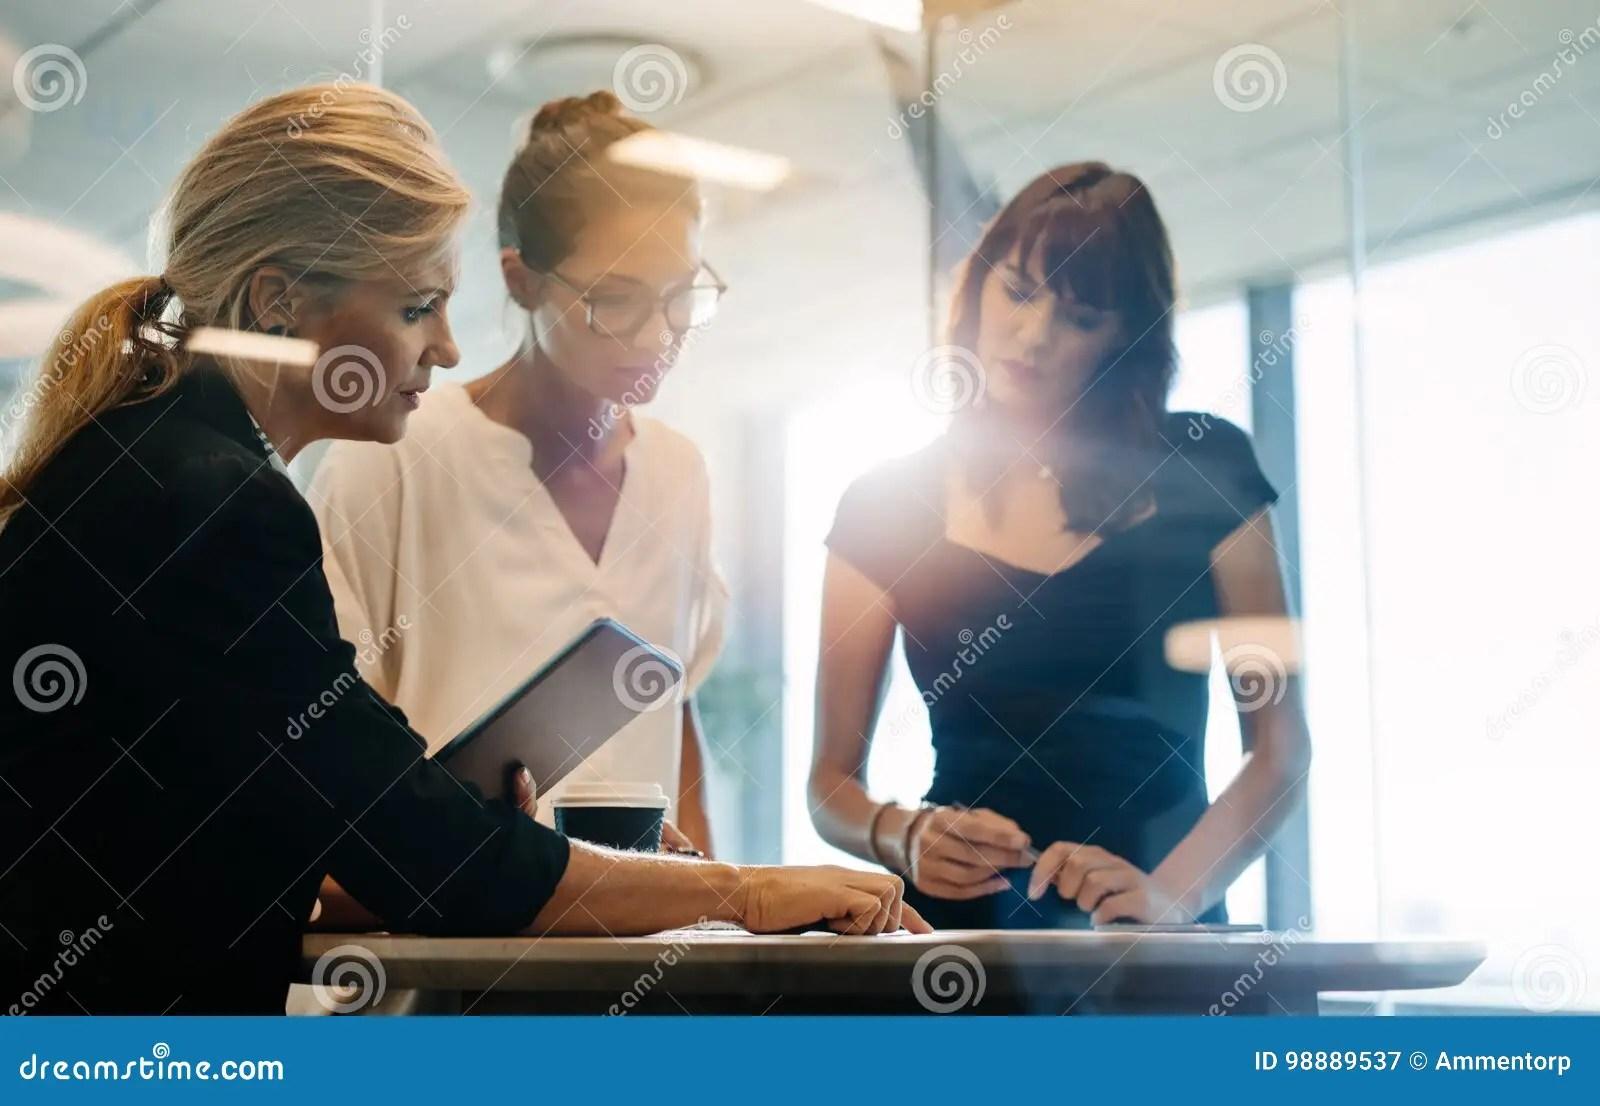 Businesswomen Brainstorming Over New Business Ideas Stock